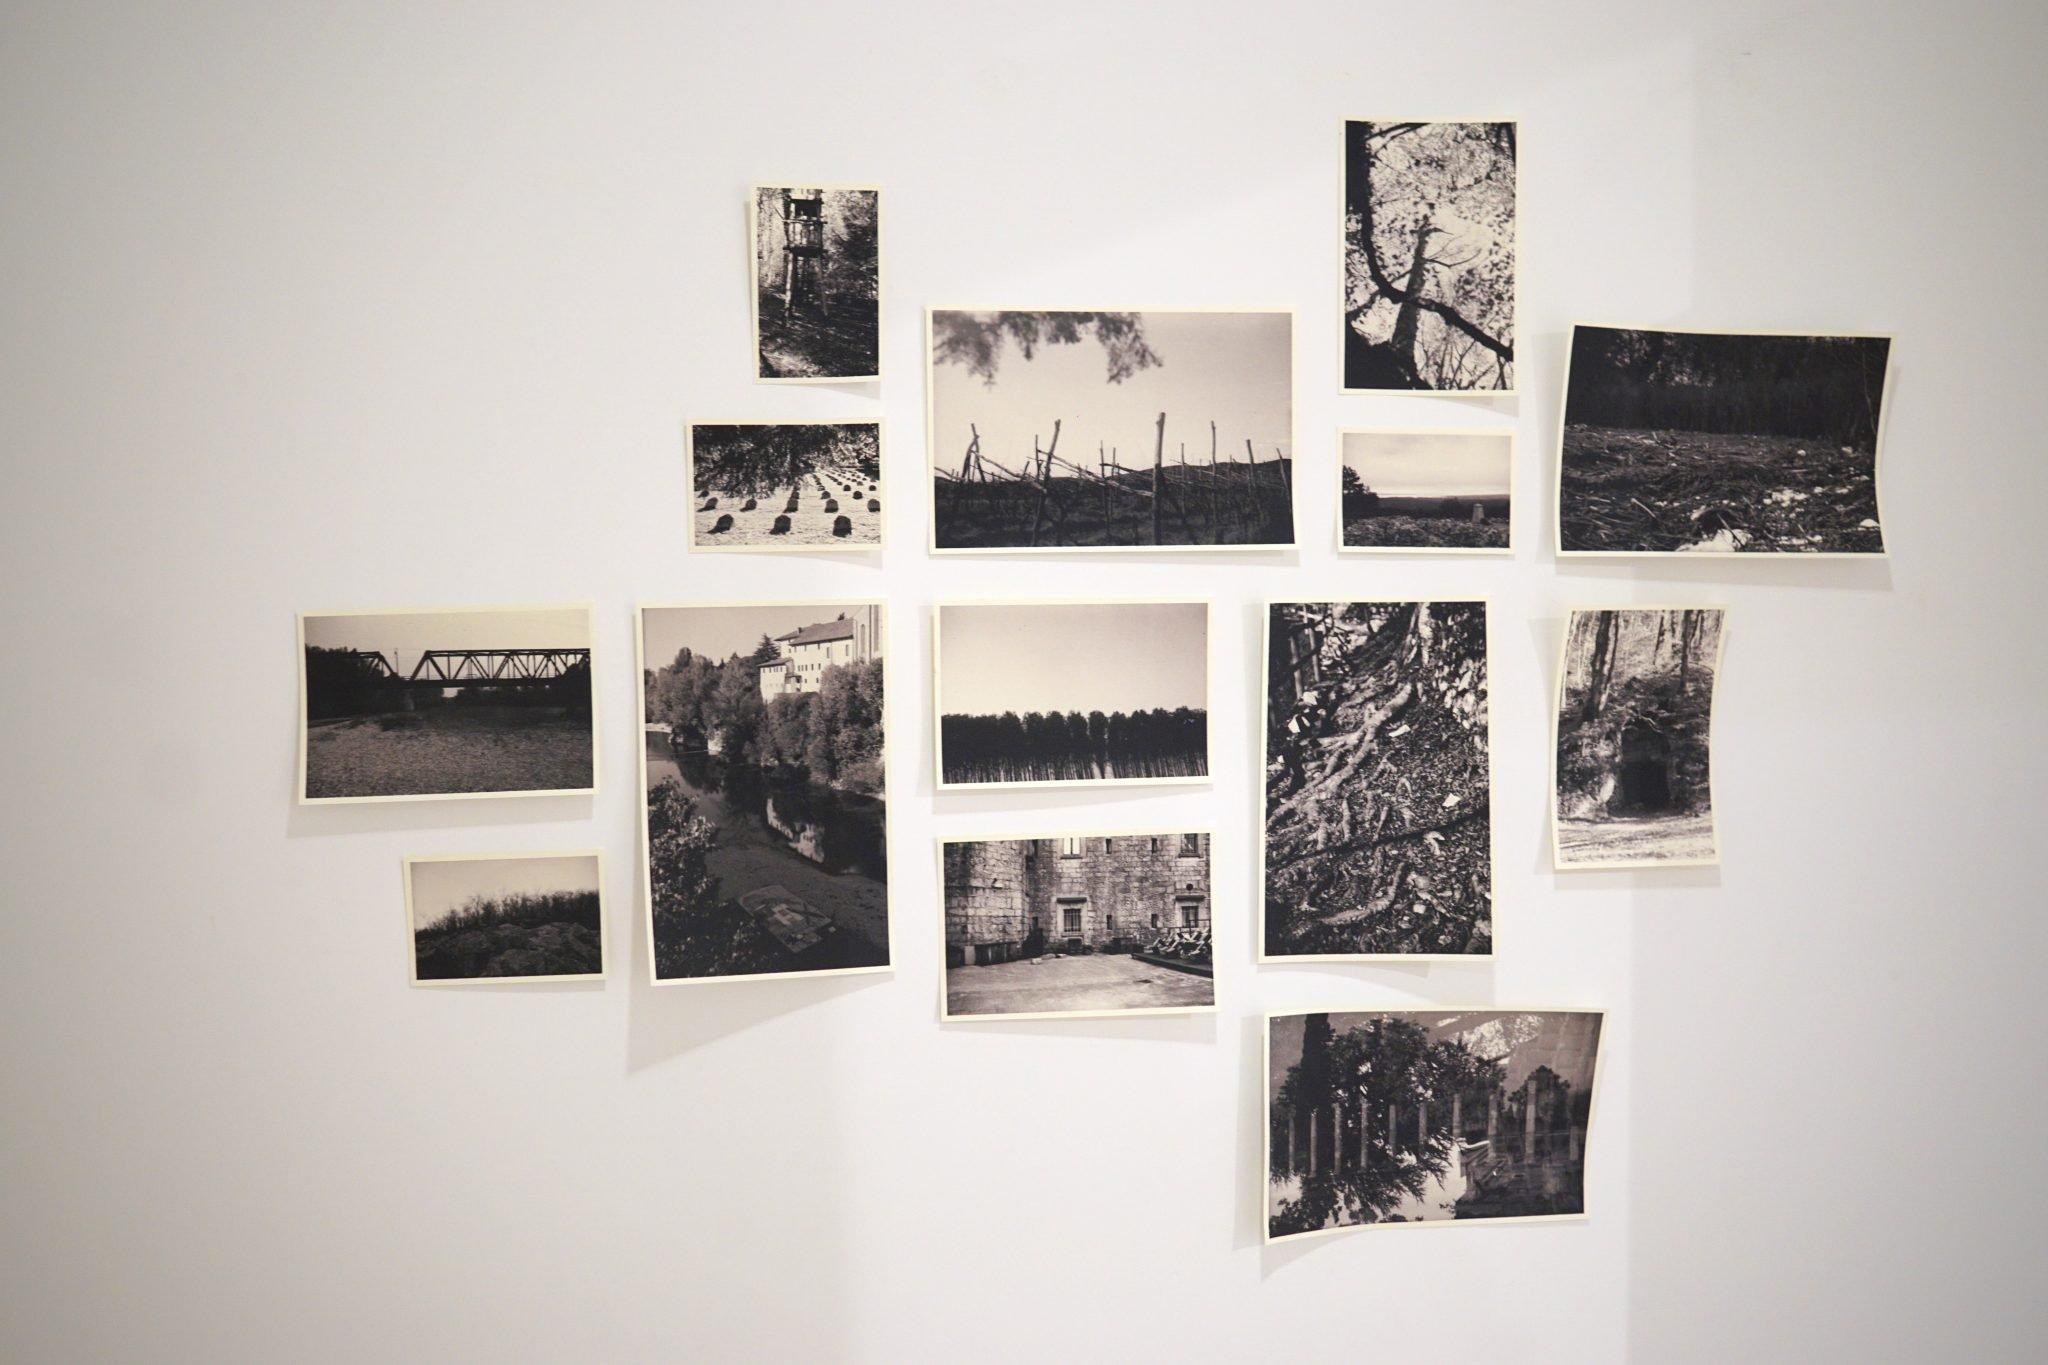 MEMORY LANDS / vista la mostra fino al 2 dicembre!